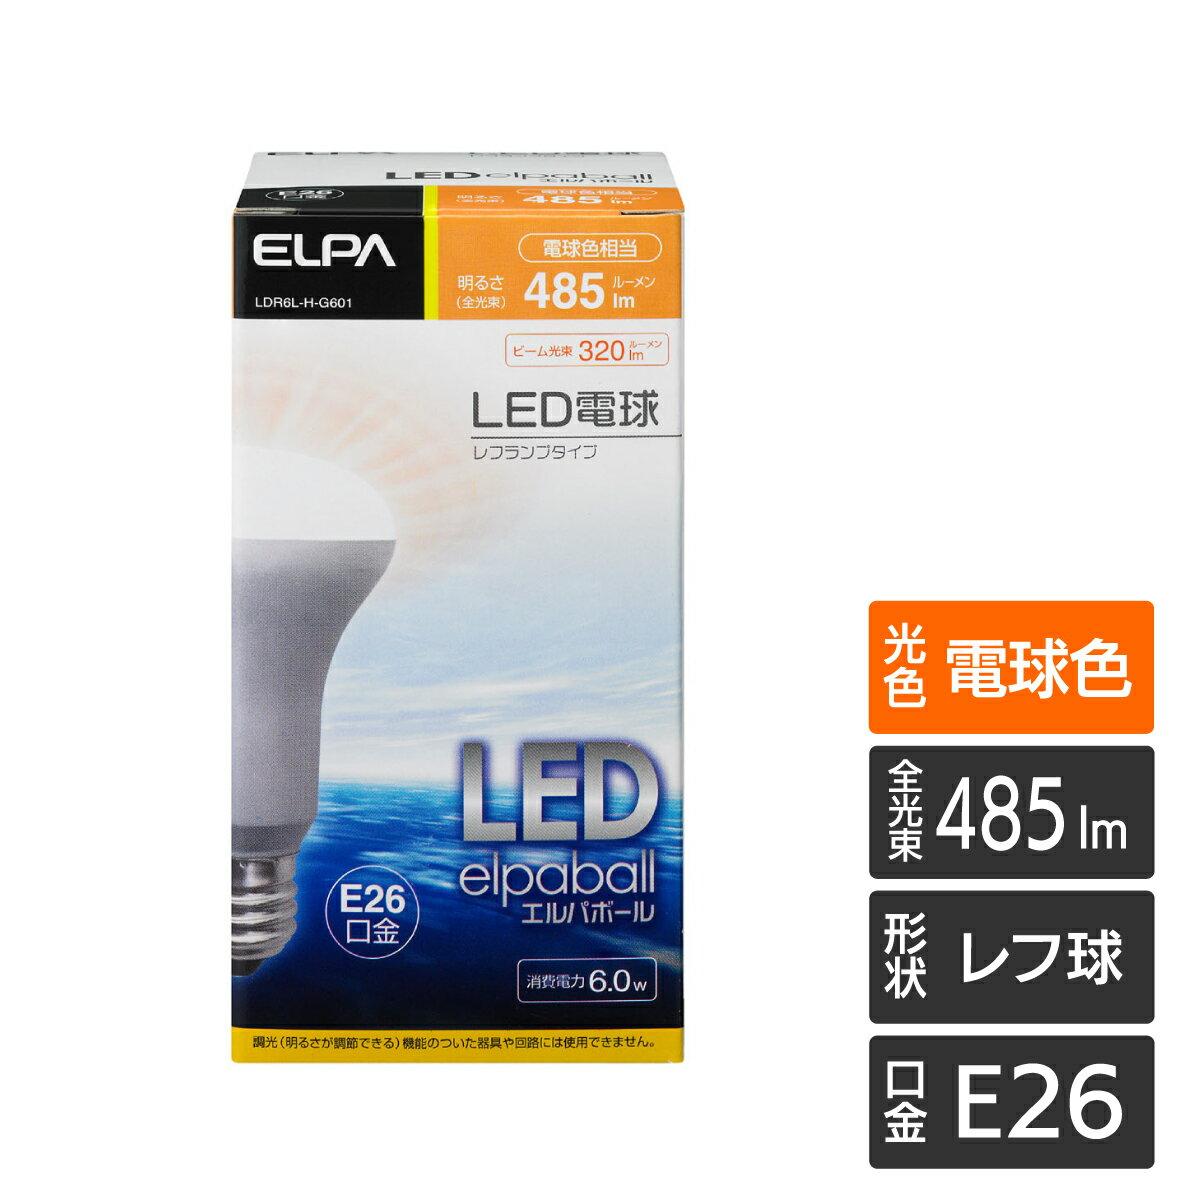 LED電球 レフランプ形 6.0WE26 (電球色相当) LDR6L-H-G601/エルパELPA 朝日電器